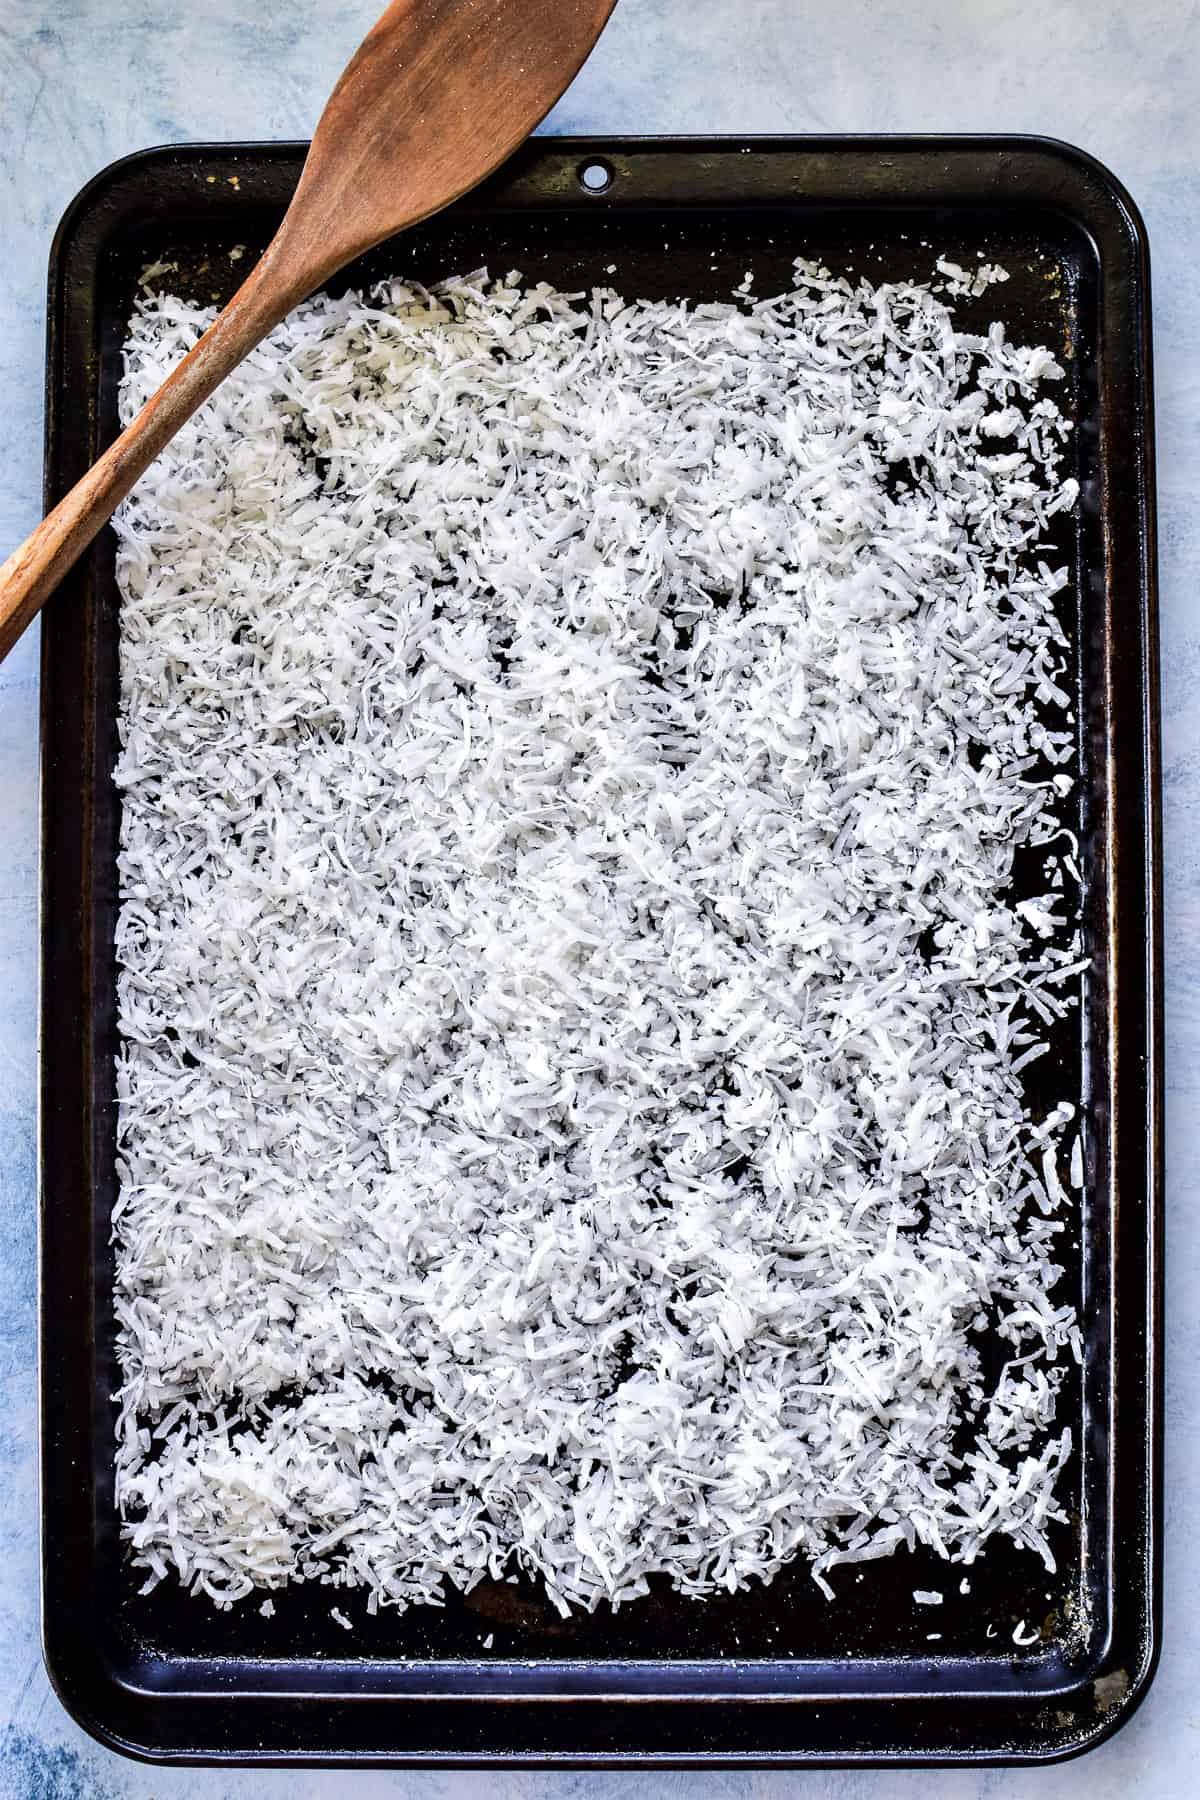 Shredded coconut on a rimmed baking sheet